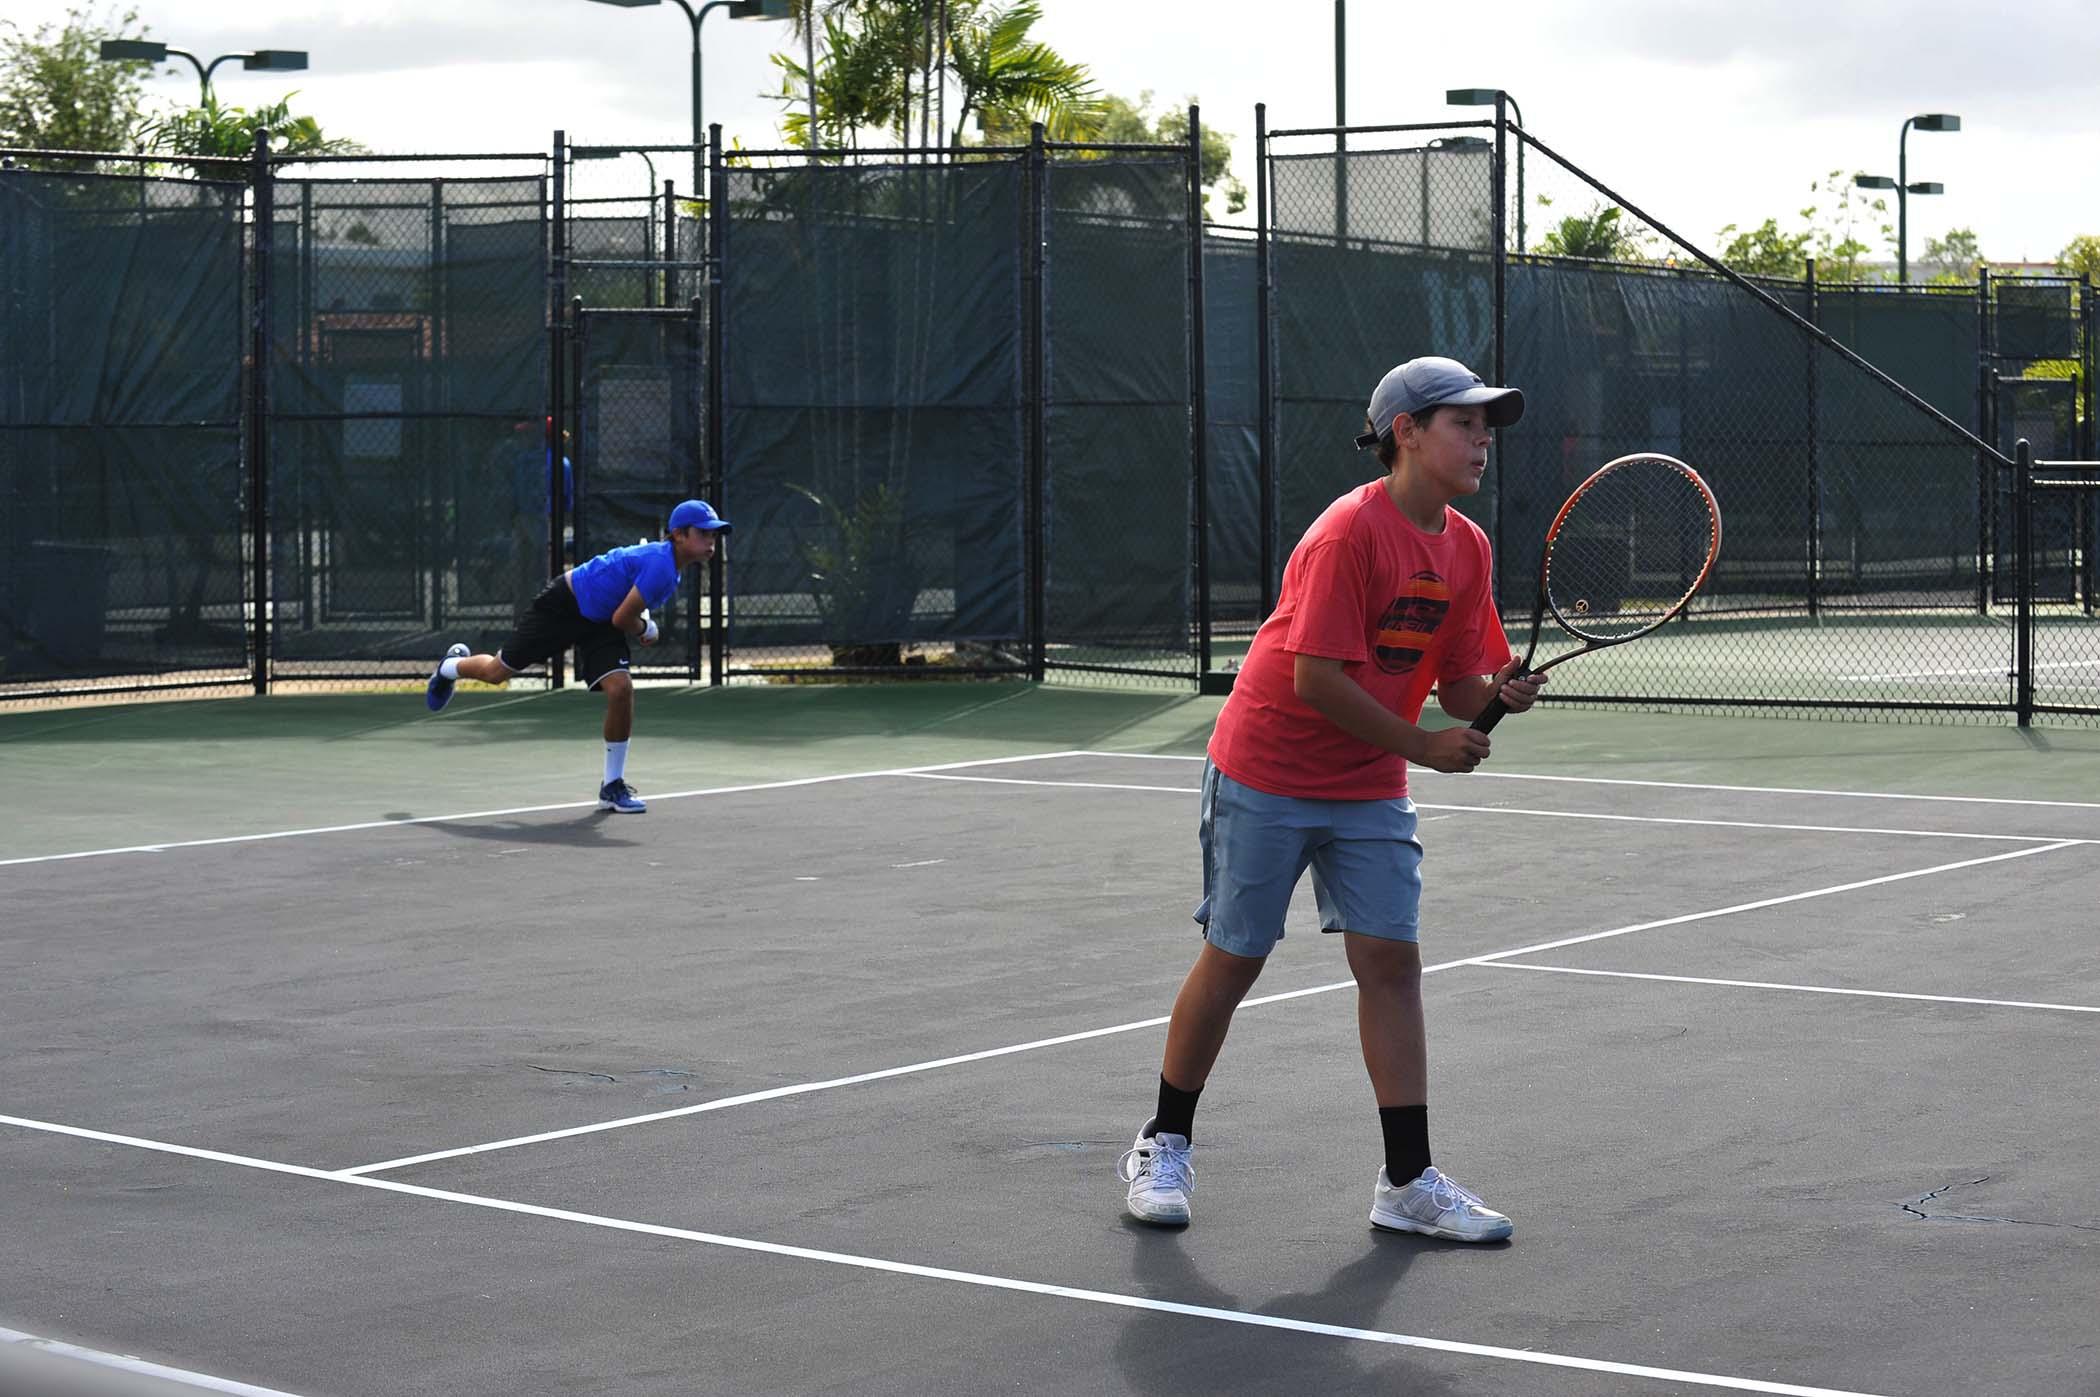 Participantes Tenis Juvenil-2-24-2018-28.jpg